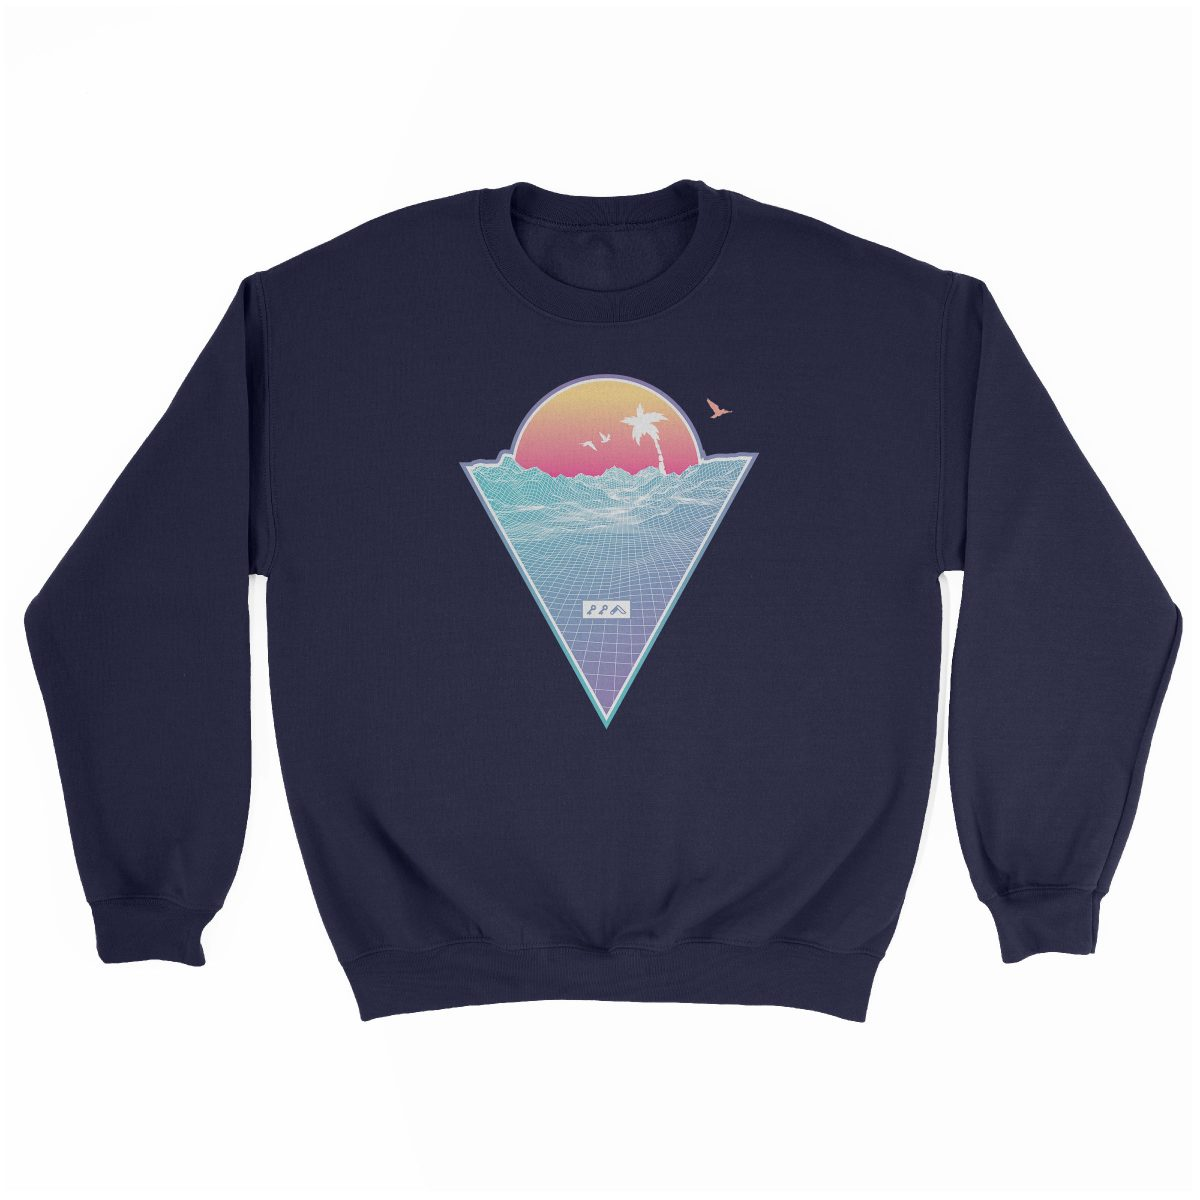 """OFF THE GRID"" cali vibes retro 80s design sweatshirt navy at kikicutt.com"